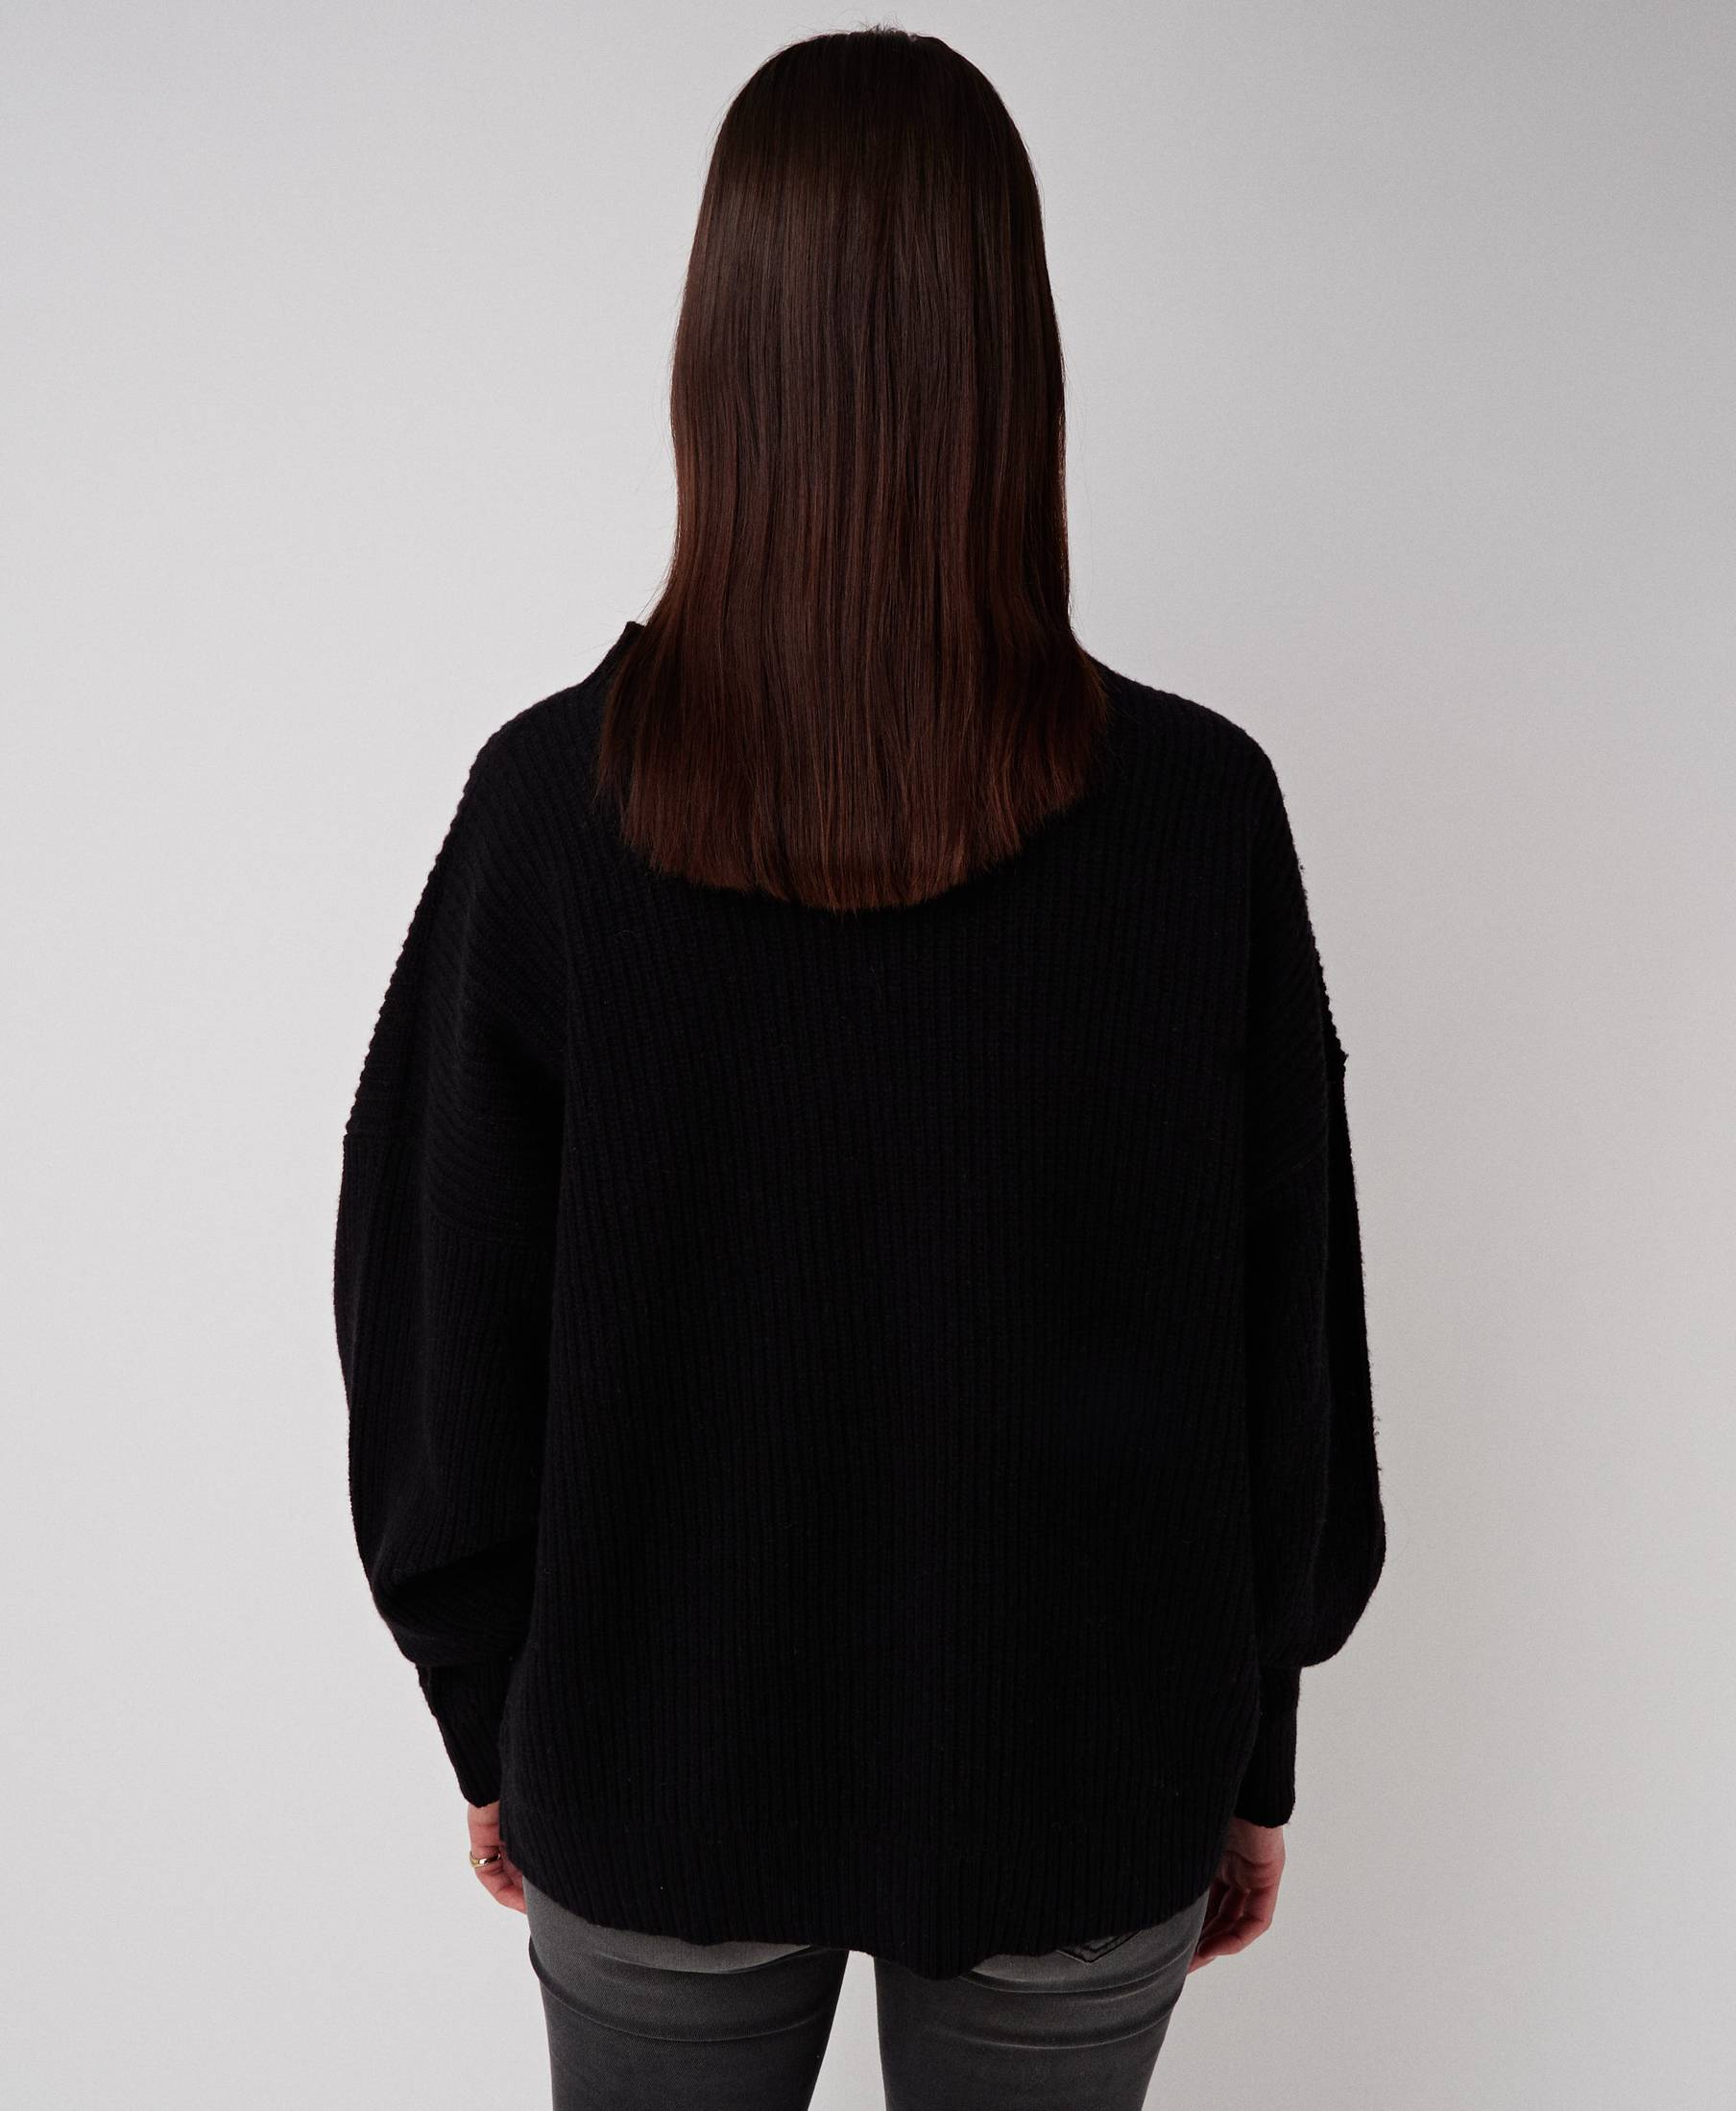 Kara Oversized Sweater Pitch Black